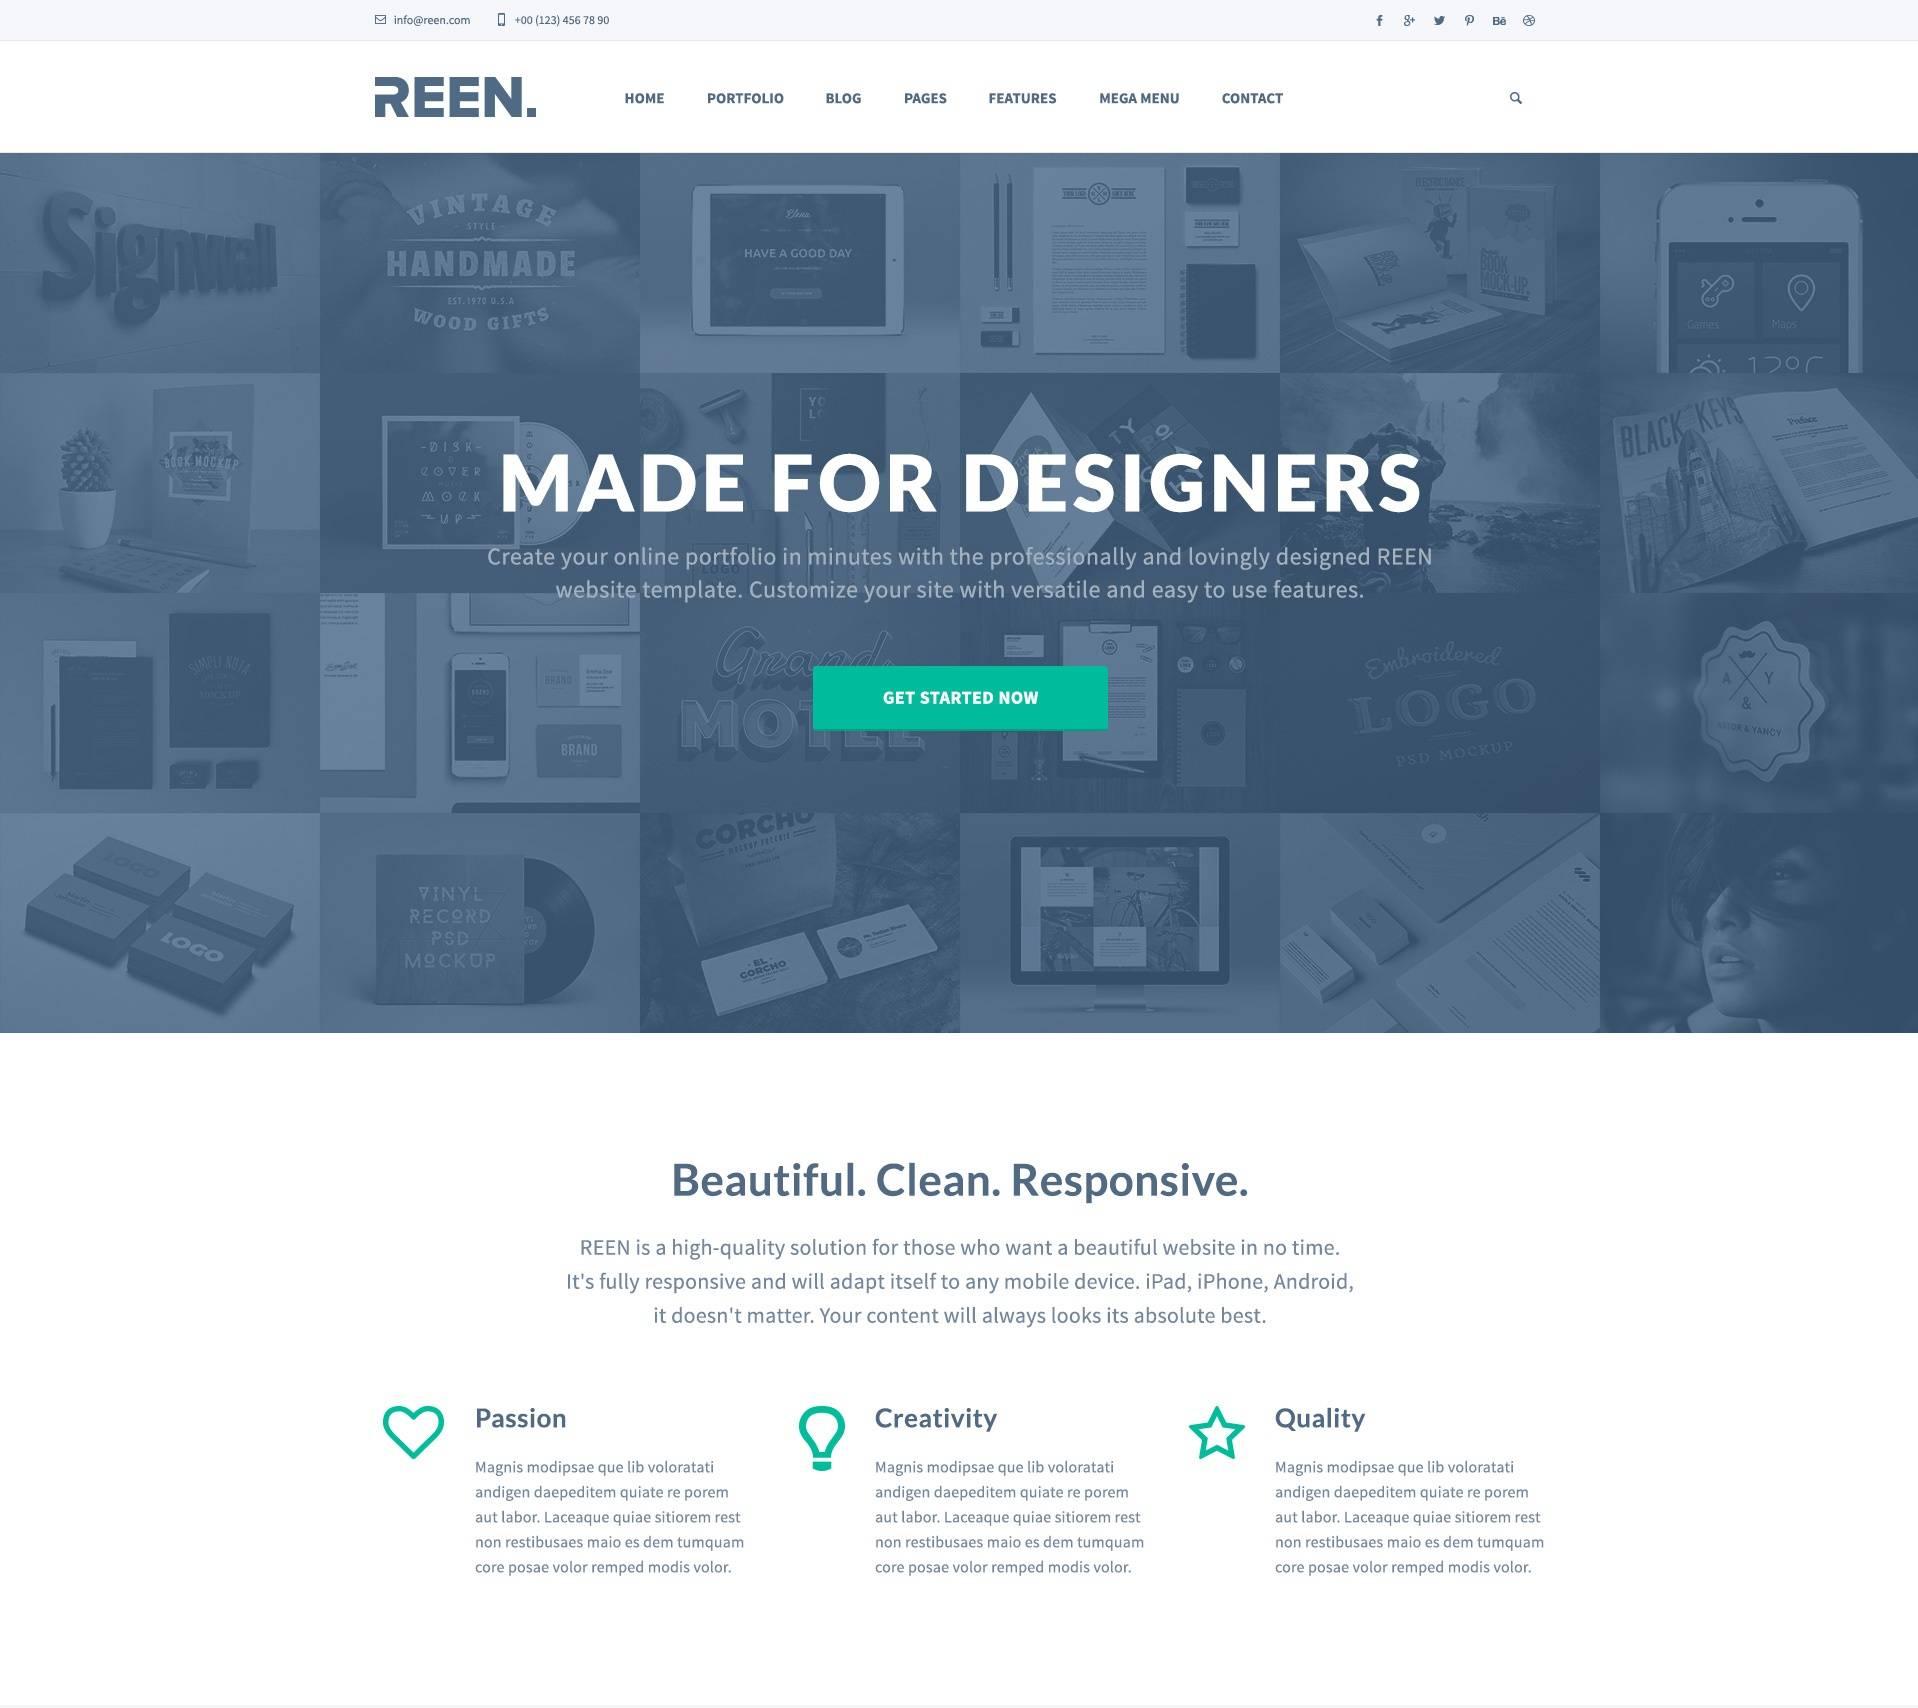 Designer Portfolio- free templates download for website